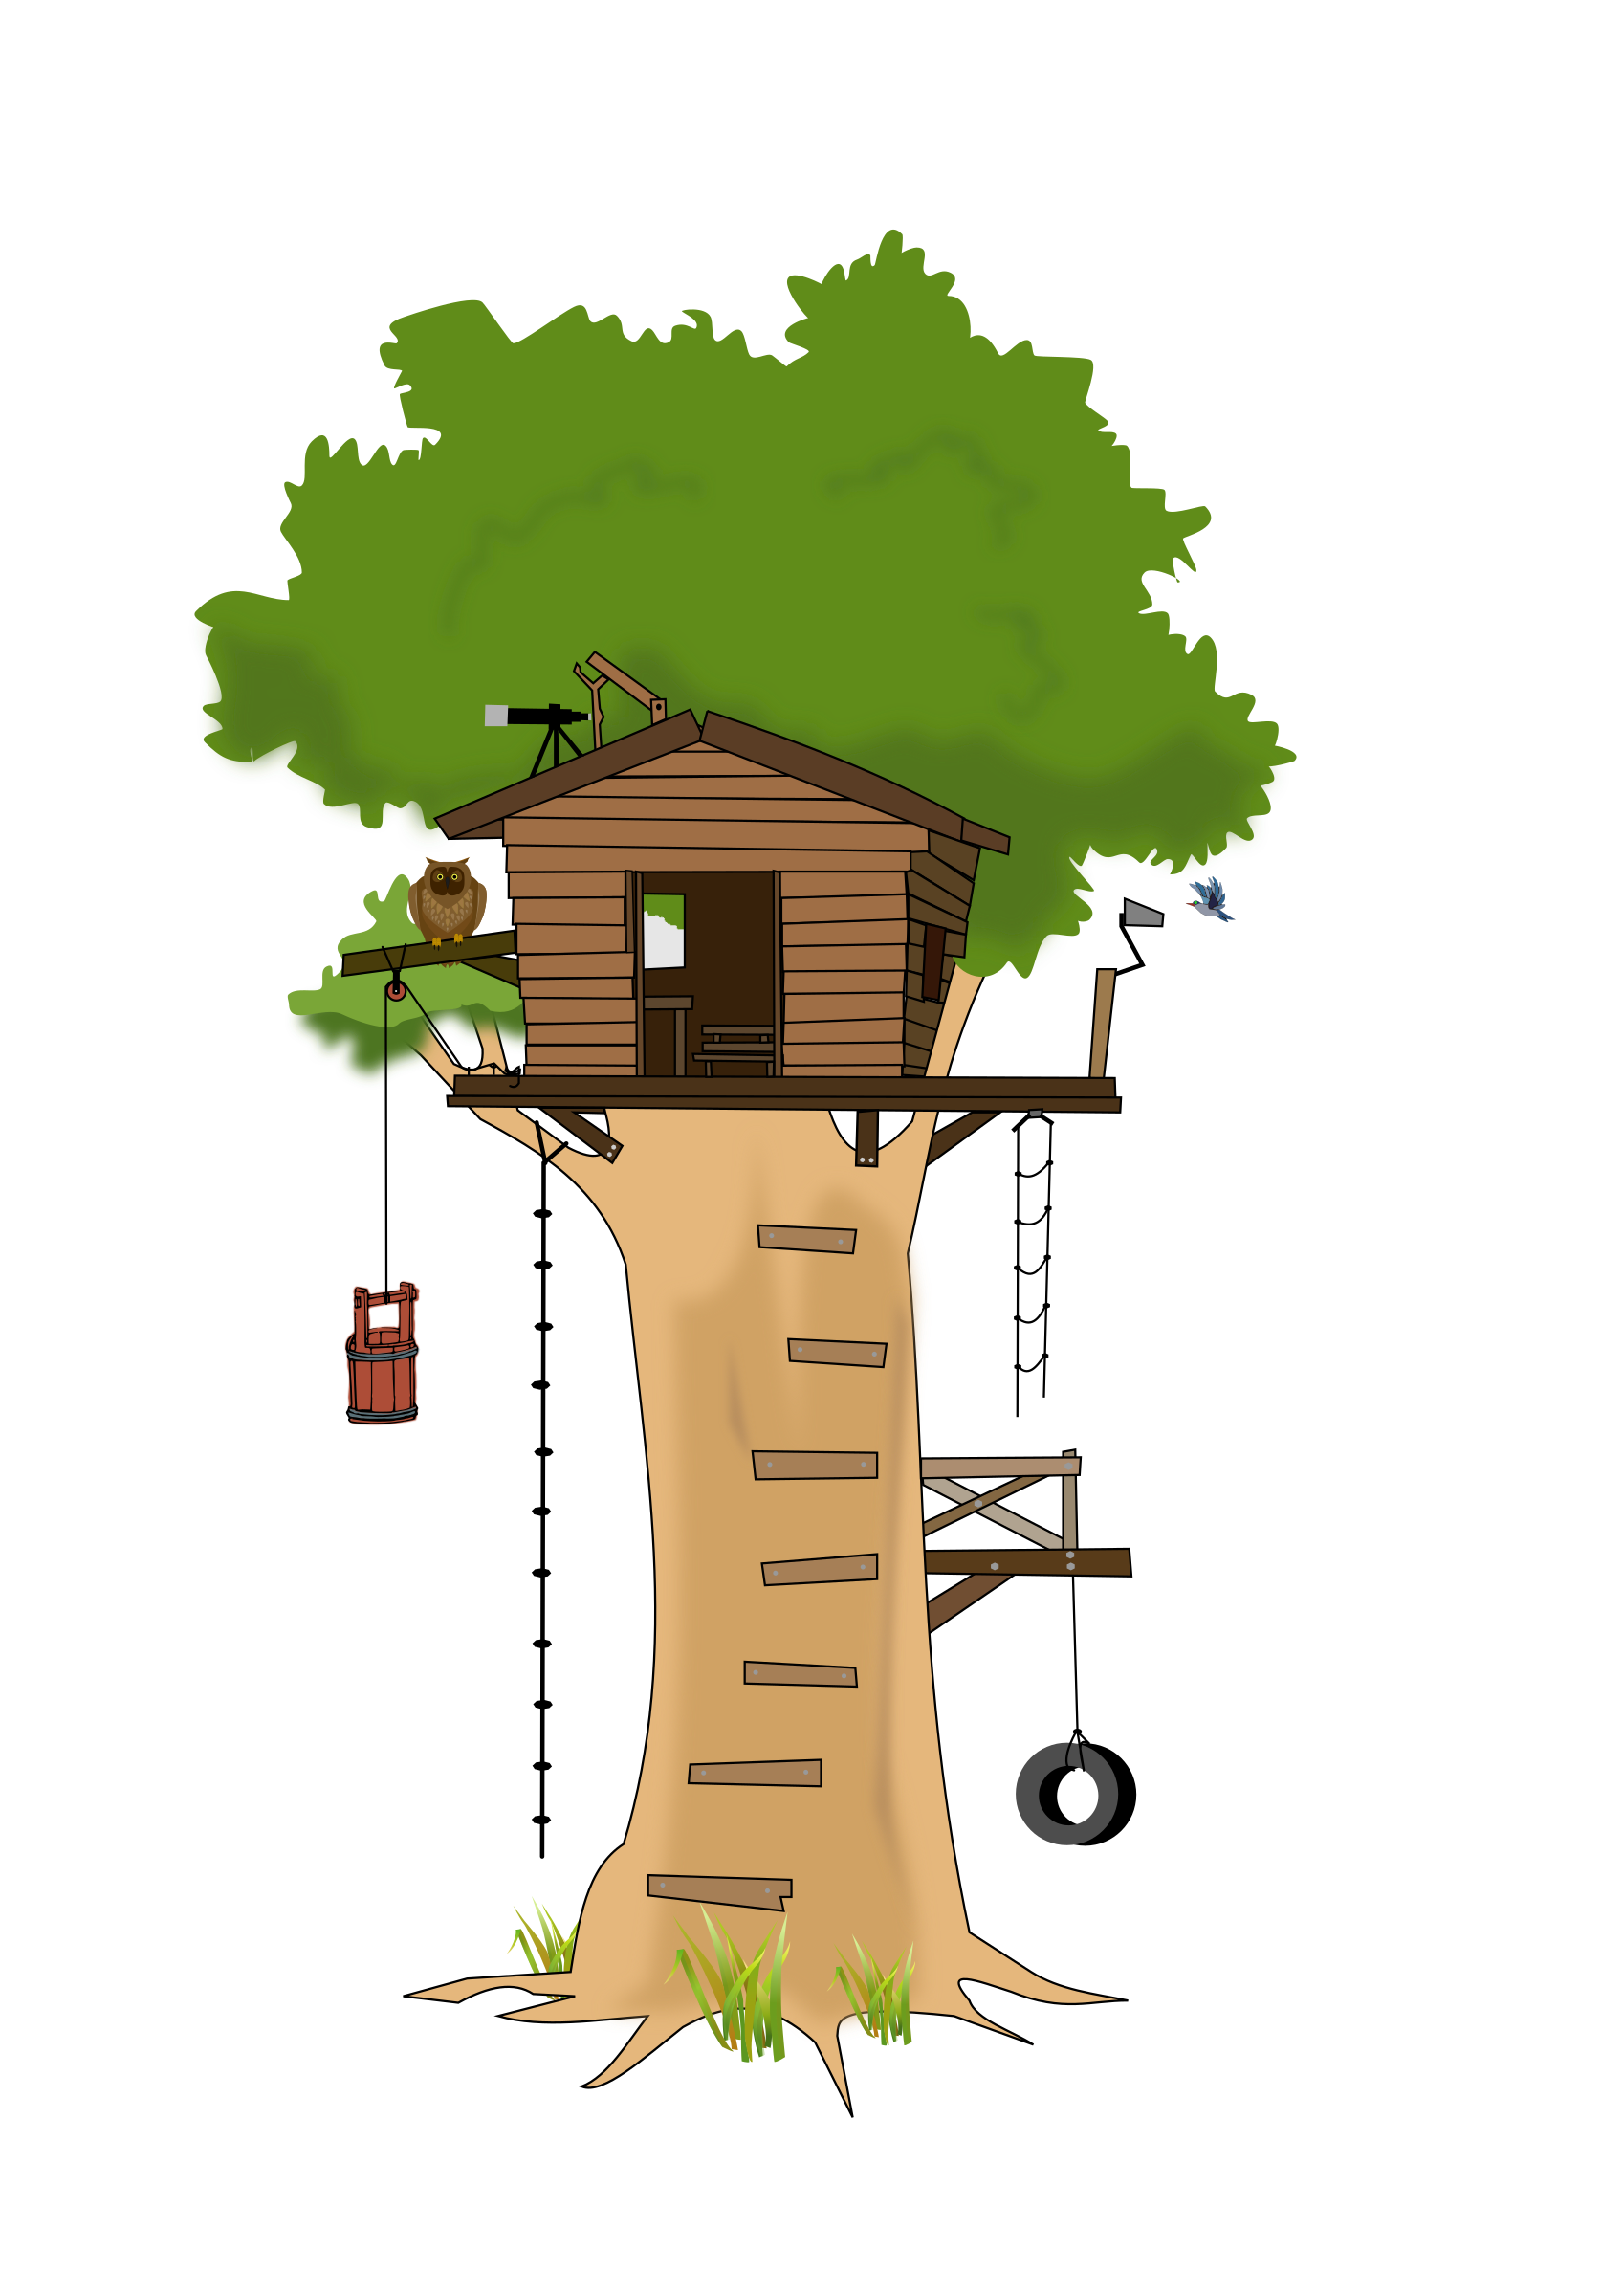 Club clipart cartoon. Tree house big image